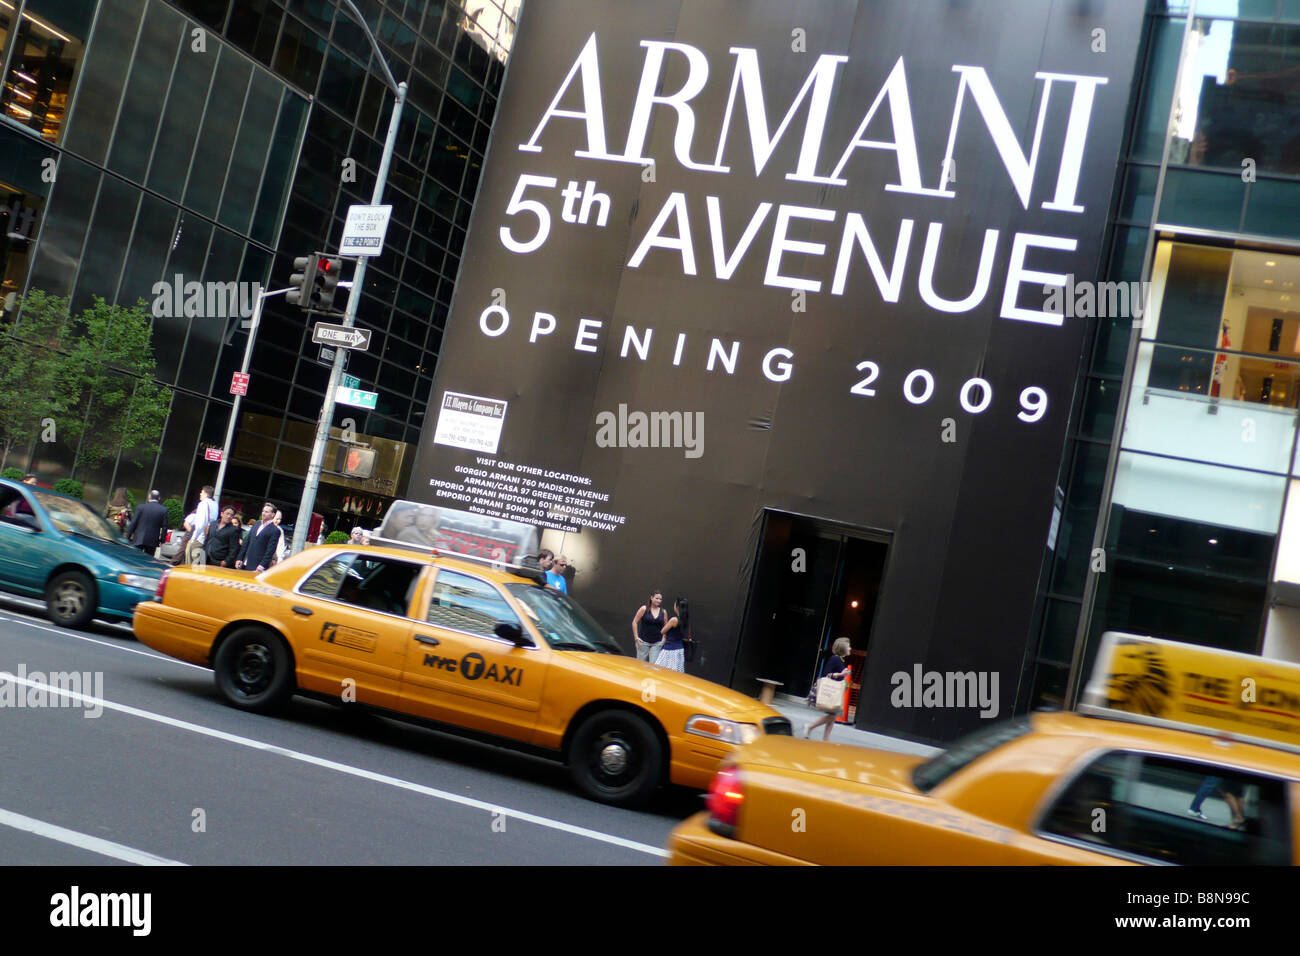 Giorgio Armani Beauty Pop Up, Armani Box, Lands In Los Angeles